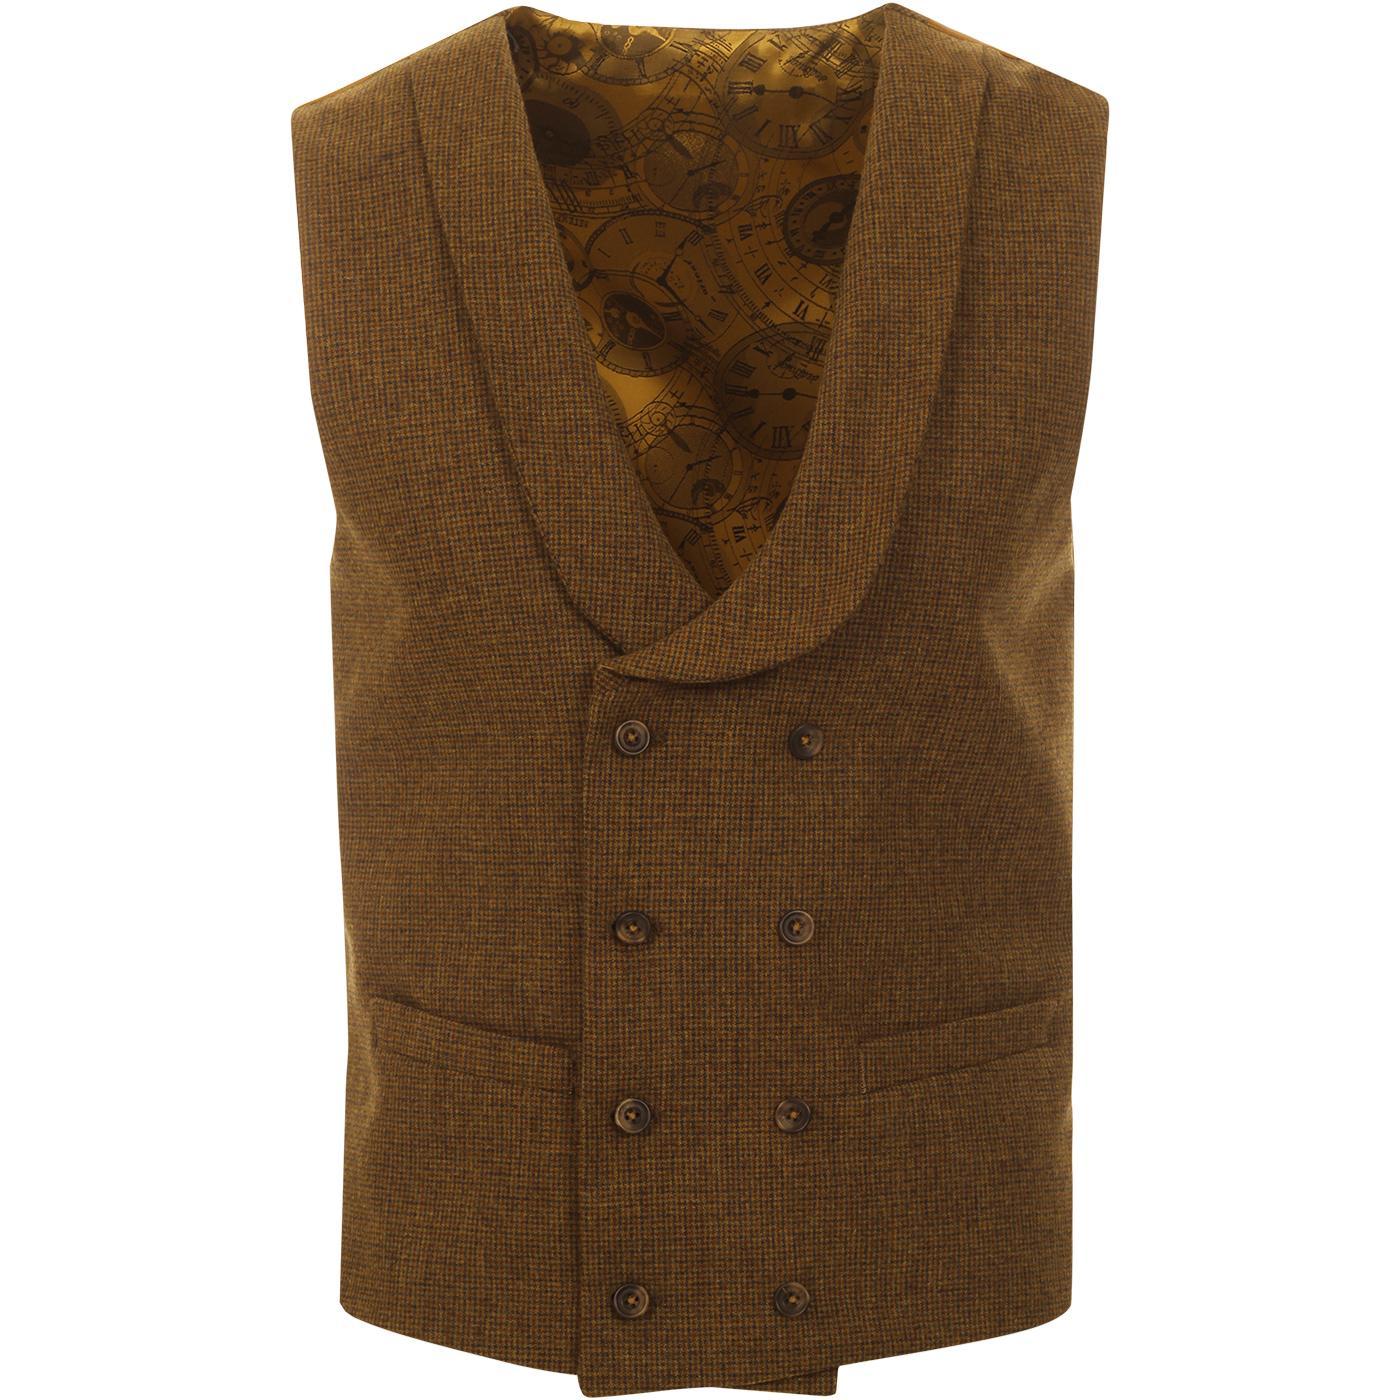 GIBSON LONDON Puppytooth Shawl Collar Waistcoat